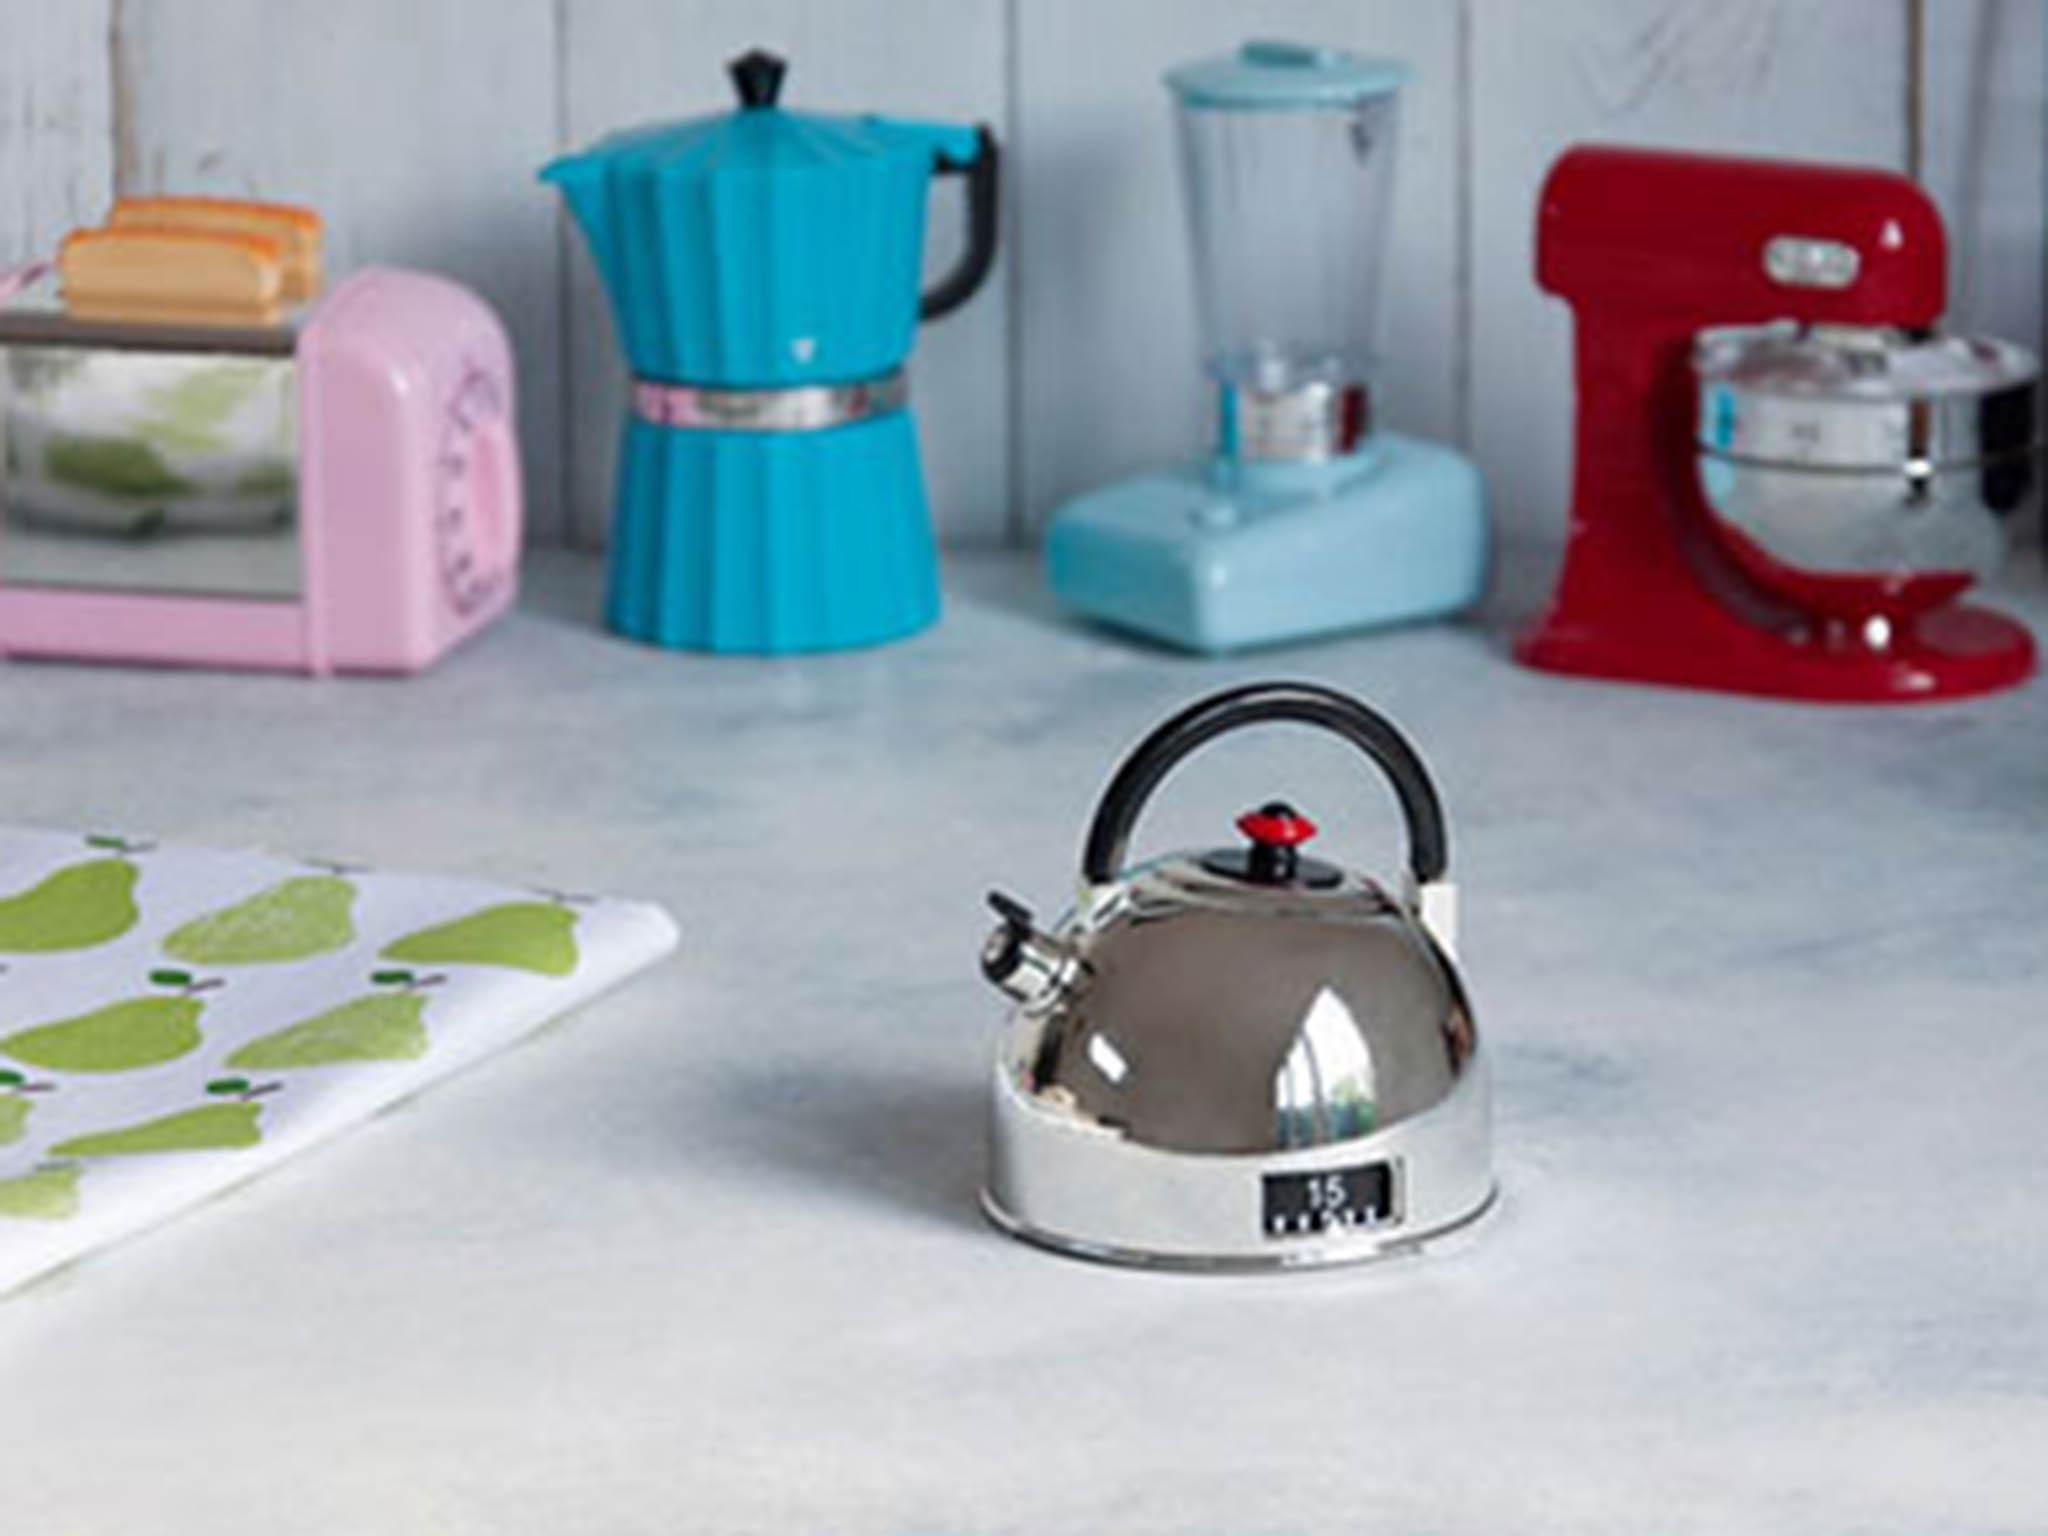 Wine Cooler Cooking Food Kitchen Timer Decorative Kettle Coffee Pot Egg Timer